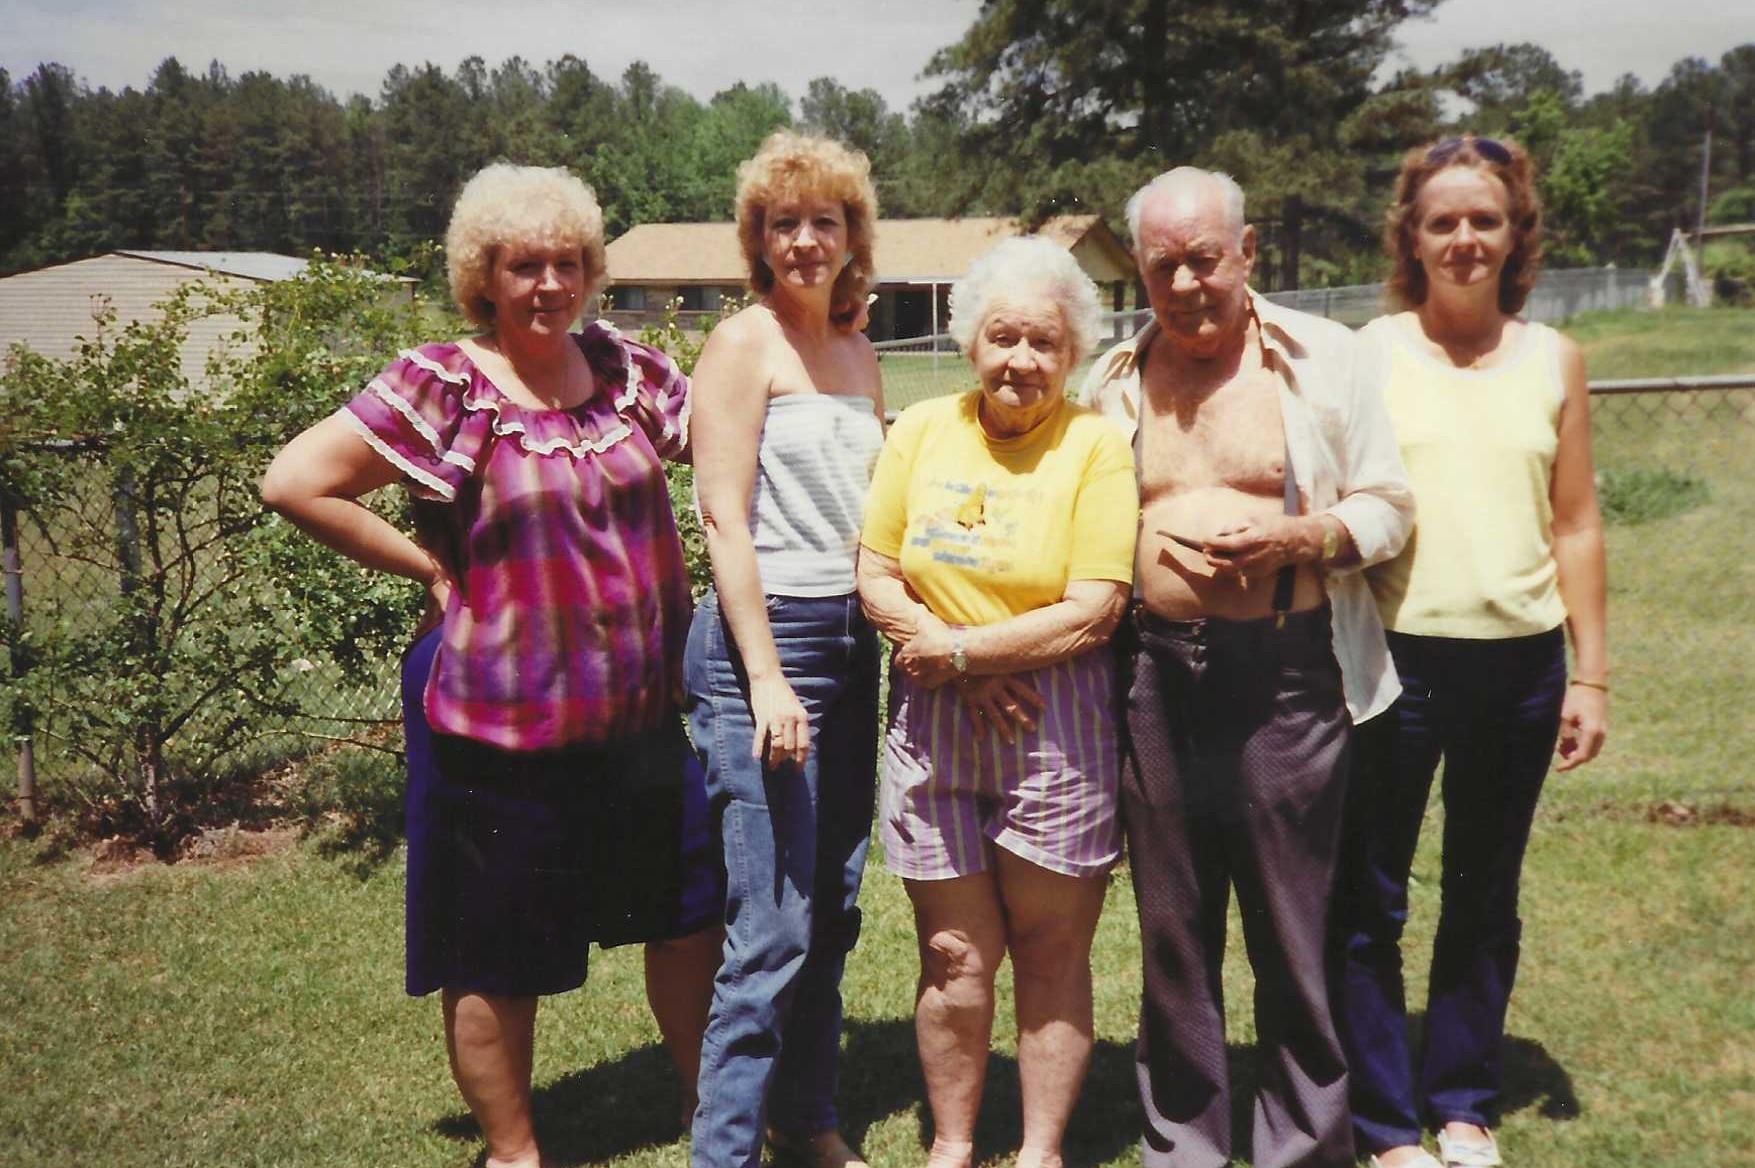 Linda with sister Ginger Faye Pugh, parents Alice and Murphy Vance, and sister Susan Carol Penick.